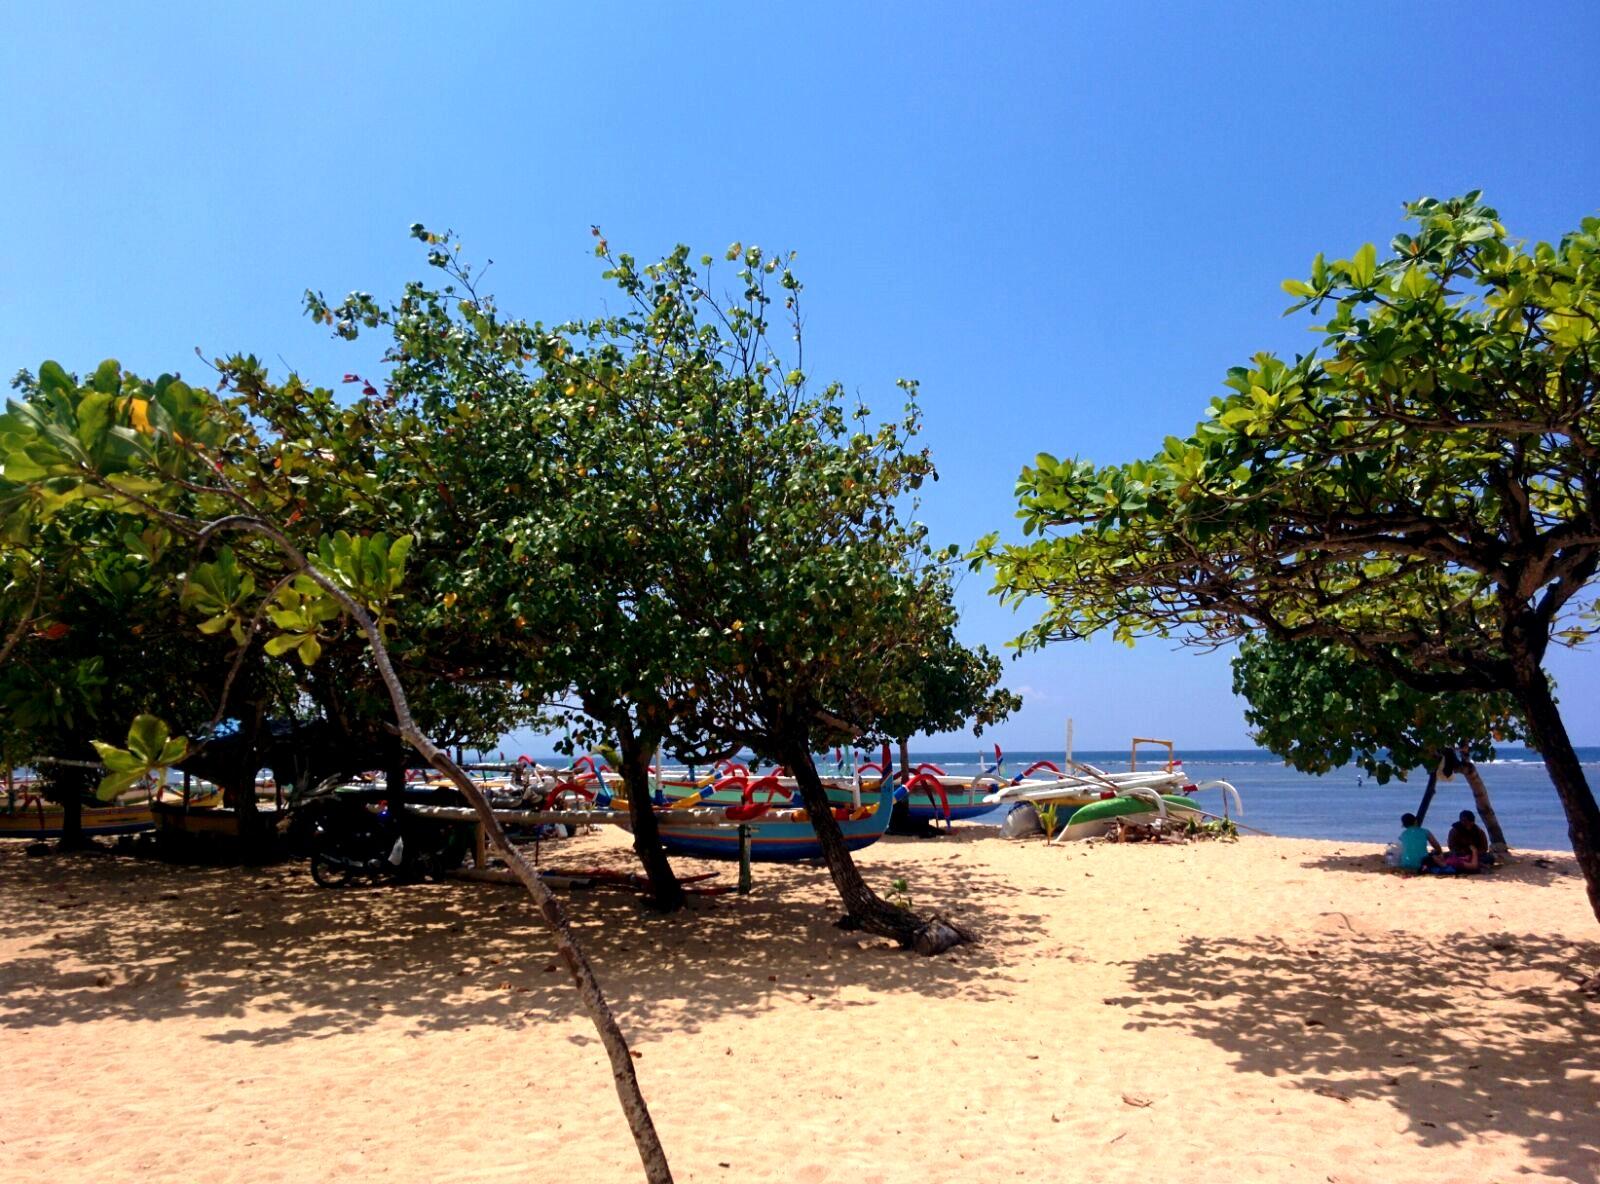 plage-sanur-bali-arbres